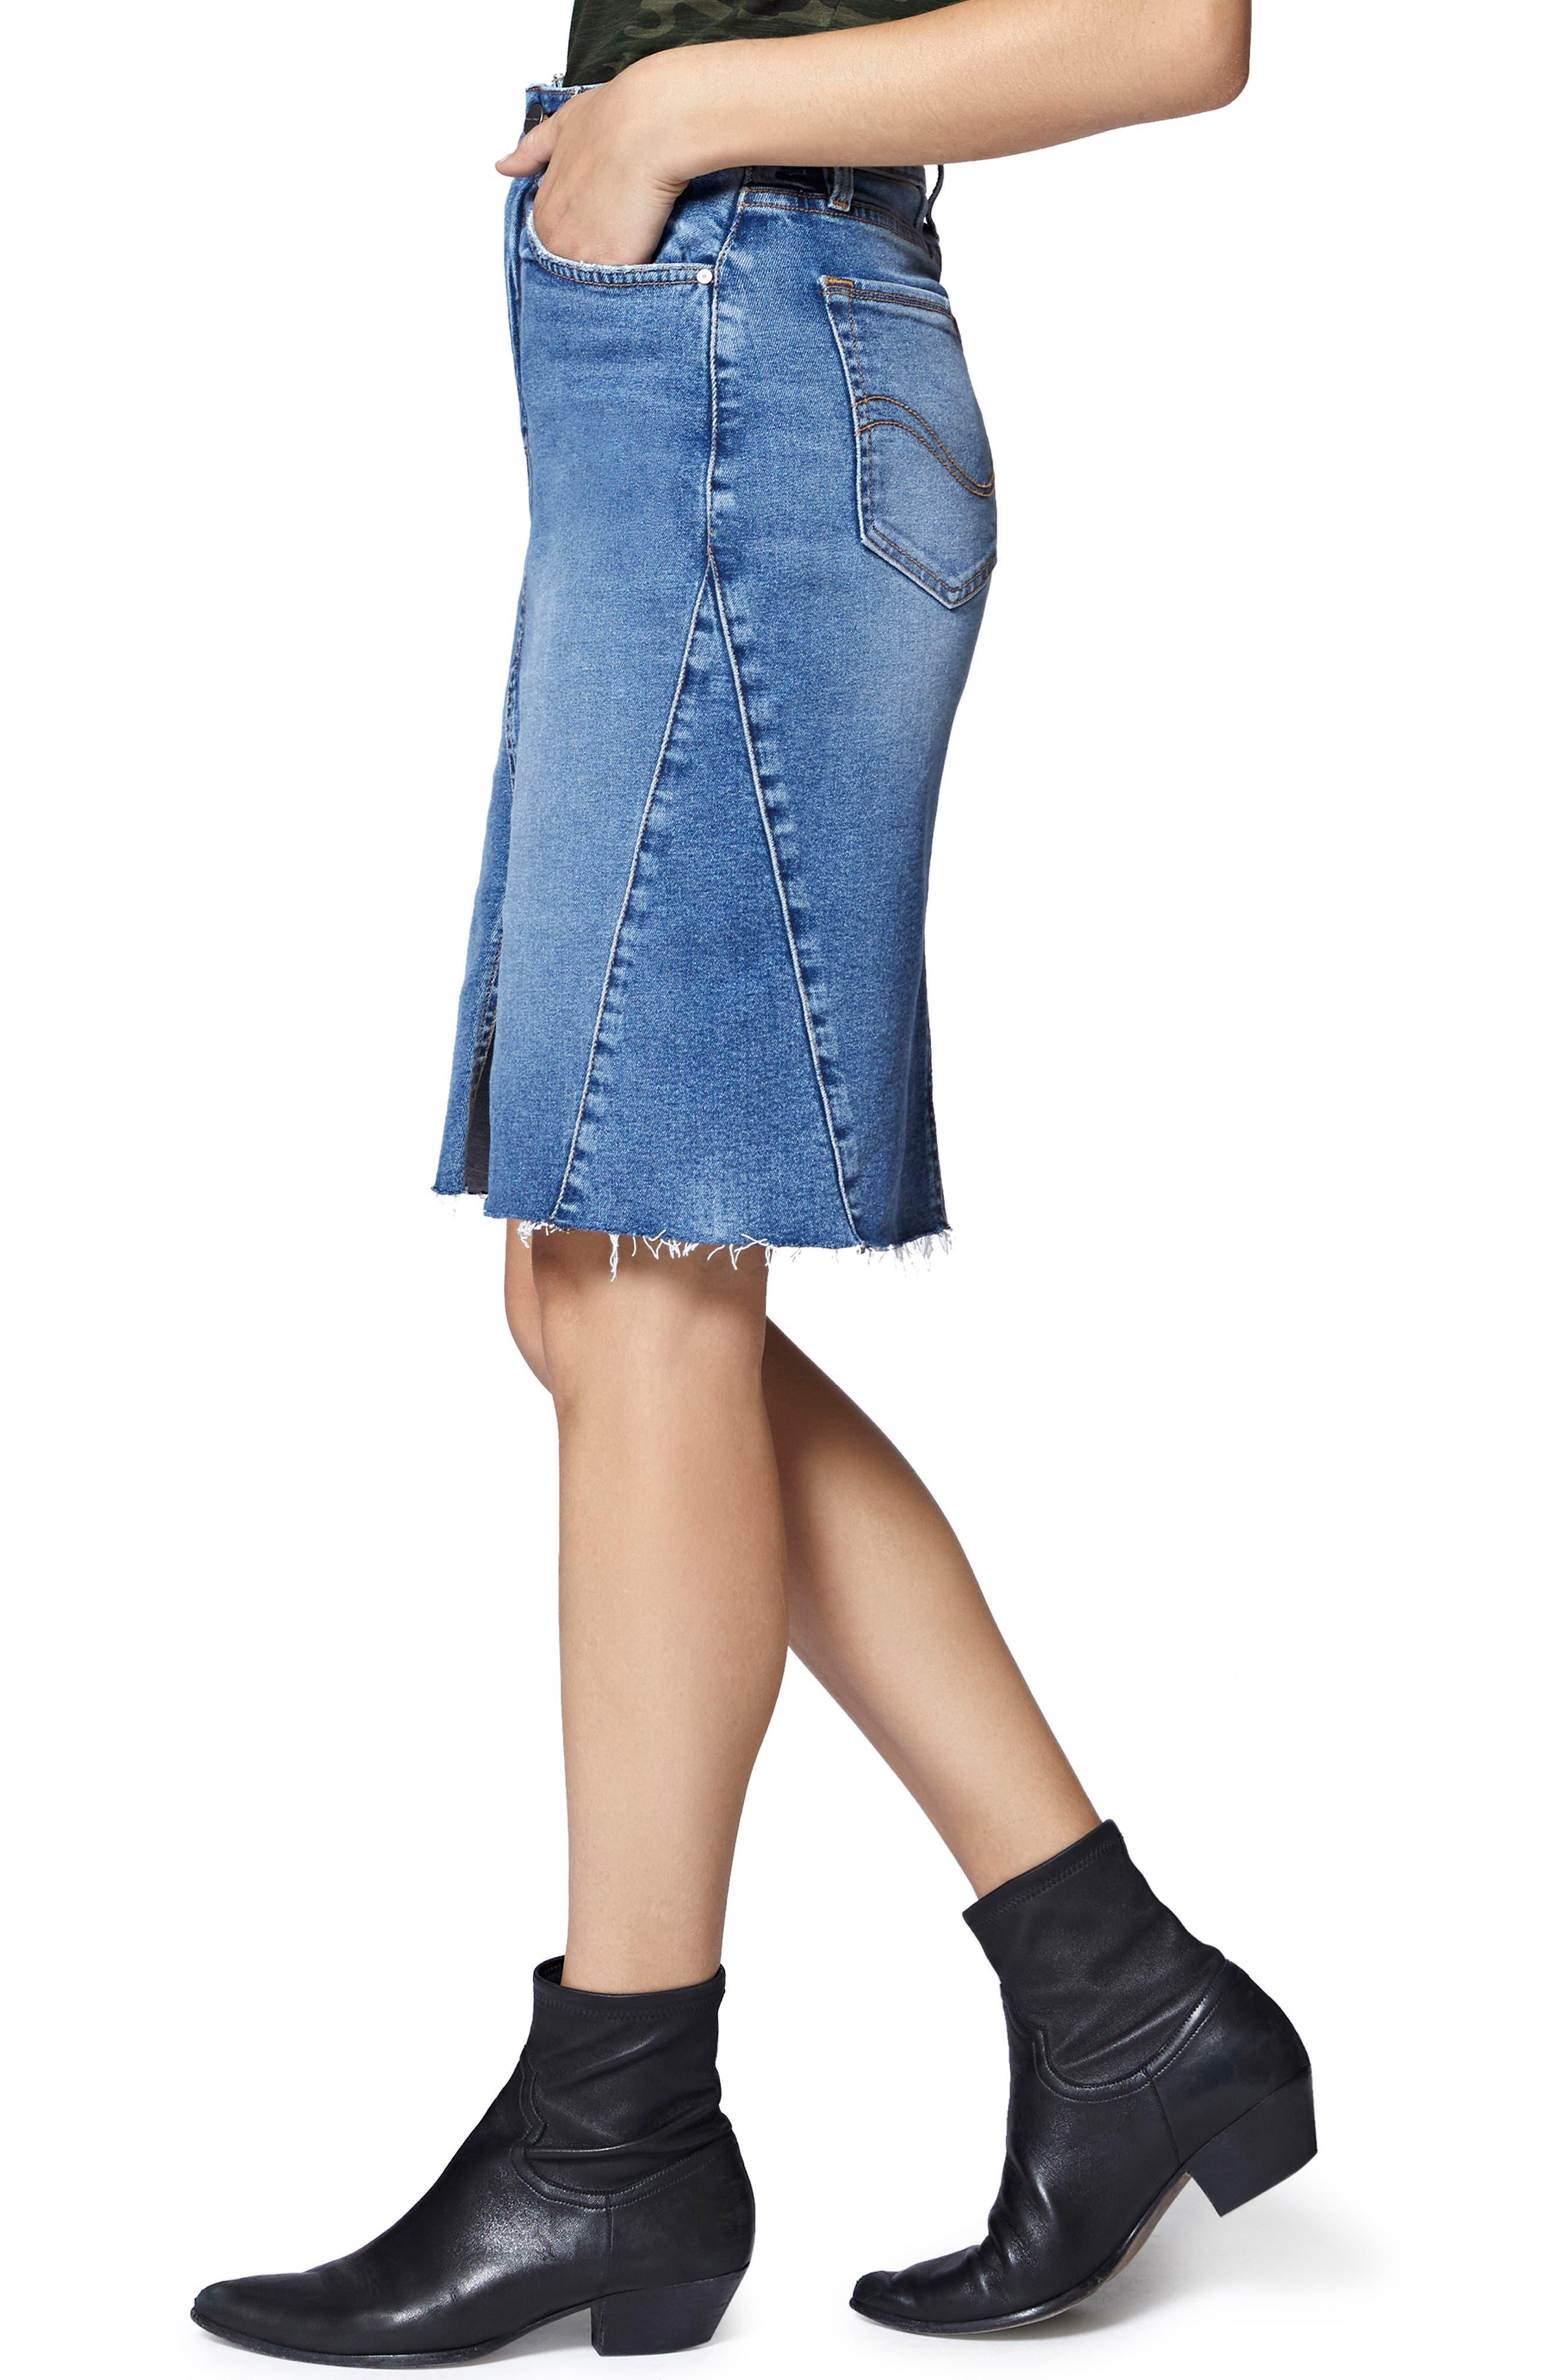 Sia A-Line Denim Skirt,                             Alternate thumbnail 3, color,                             FLAT IRON RIGID